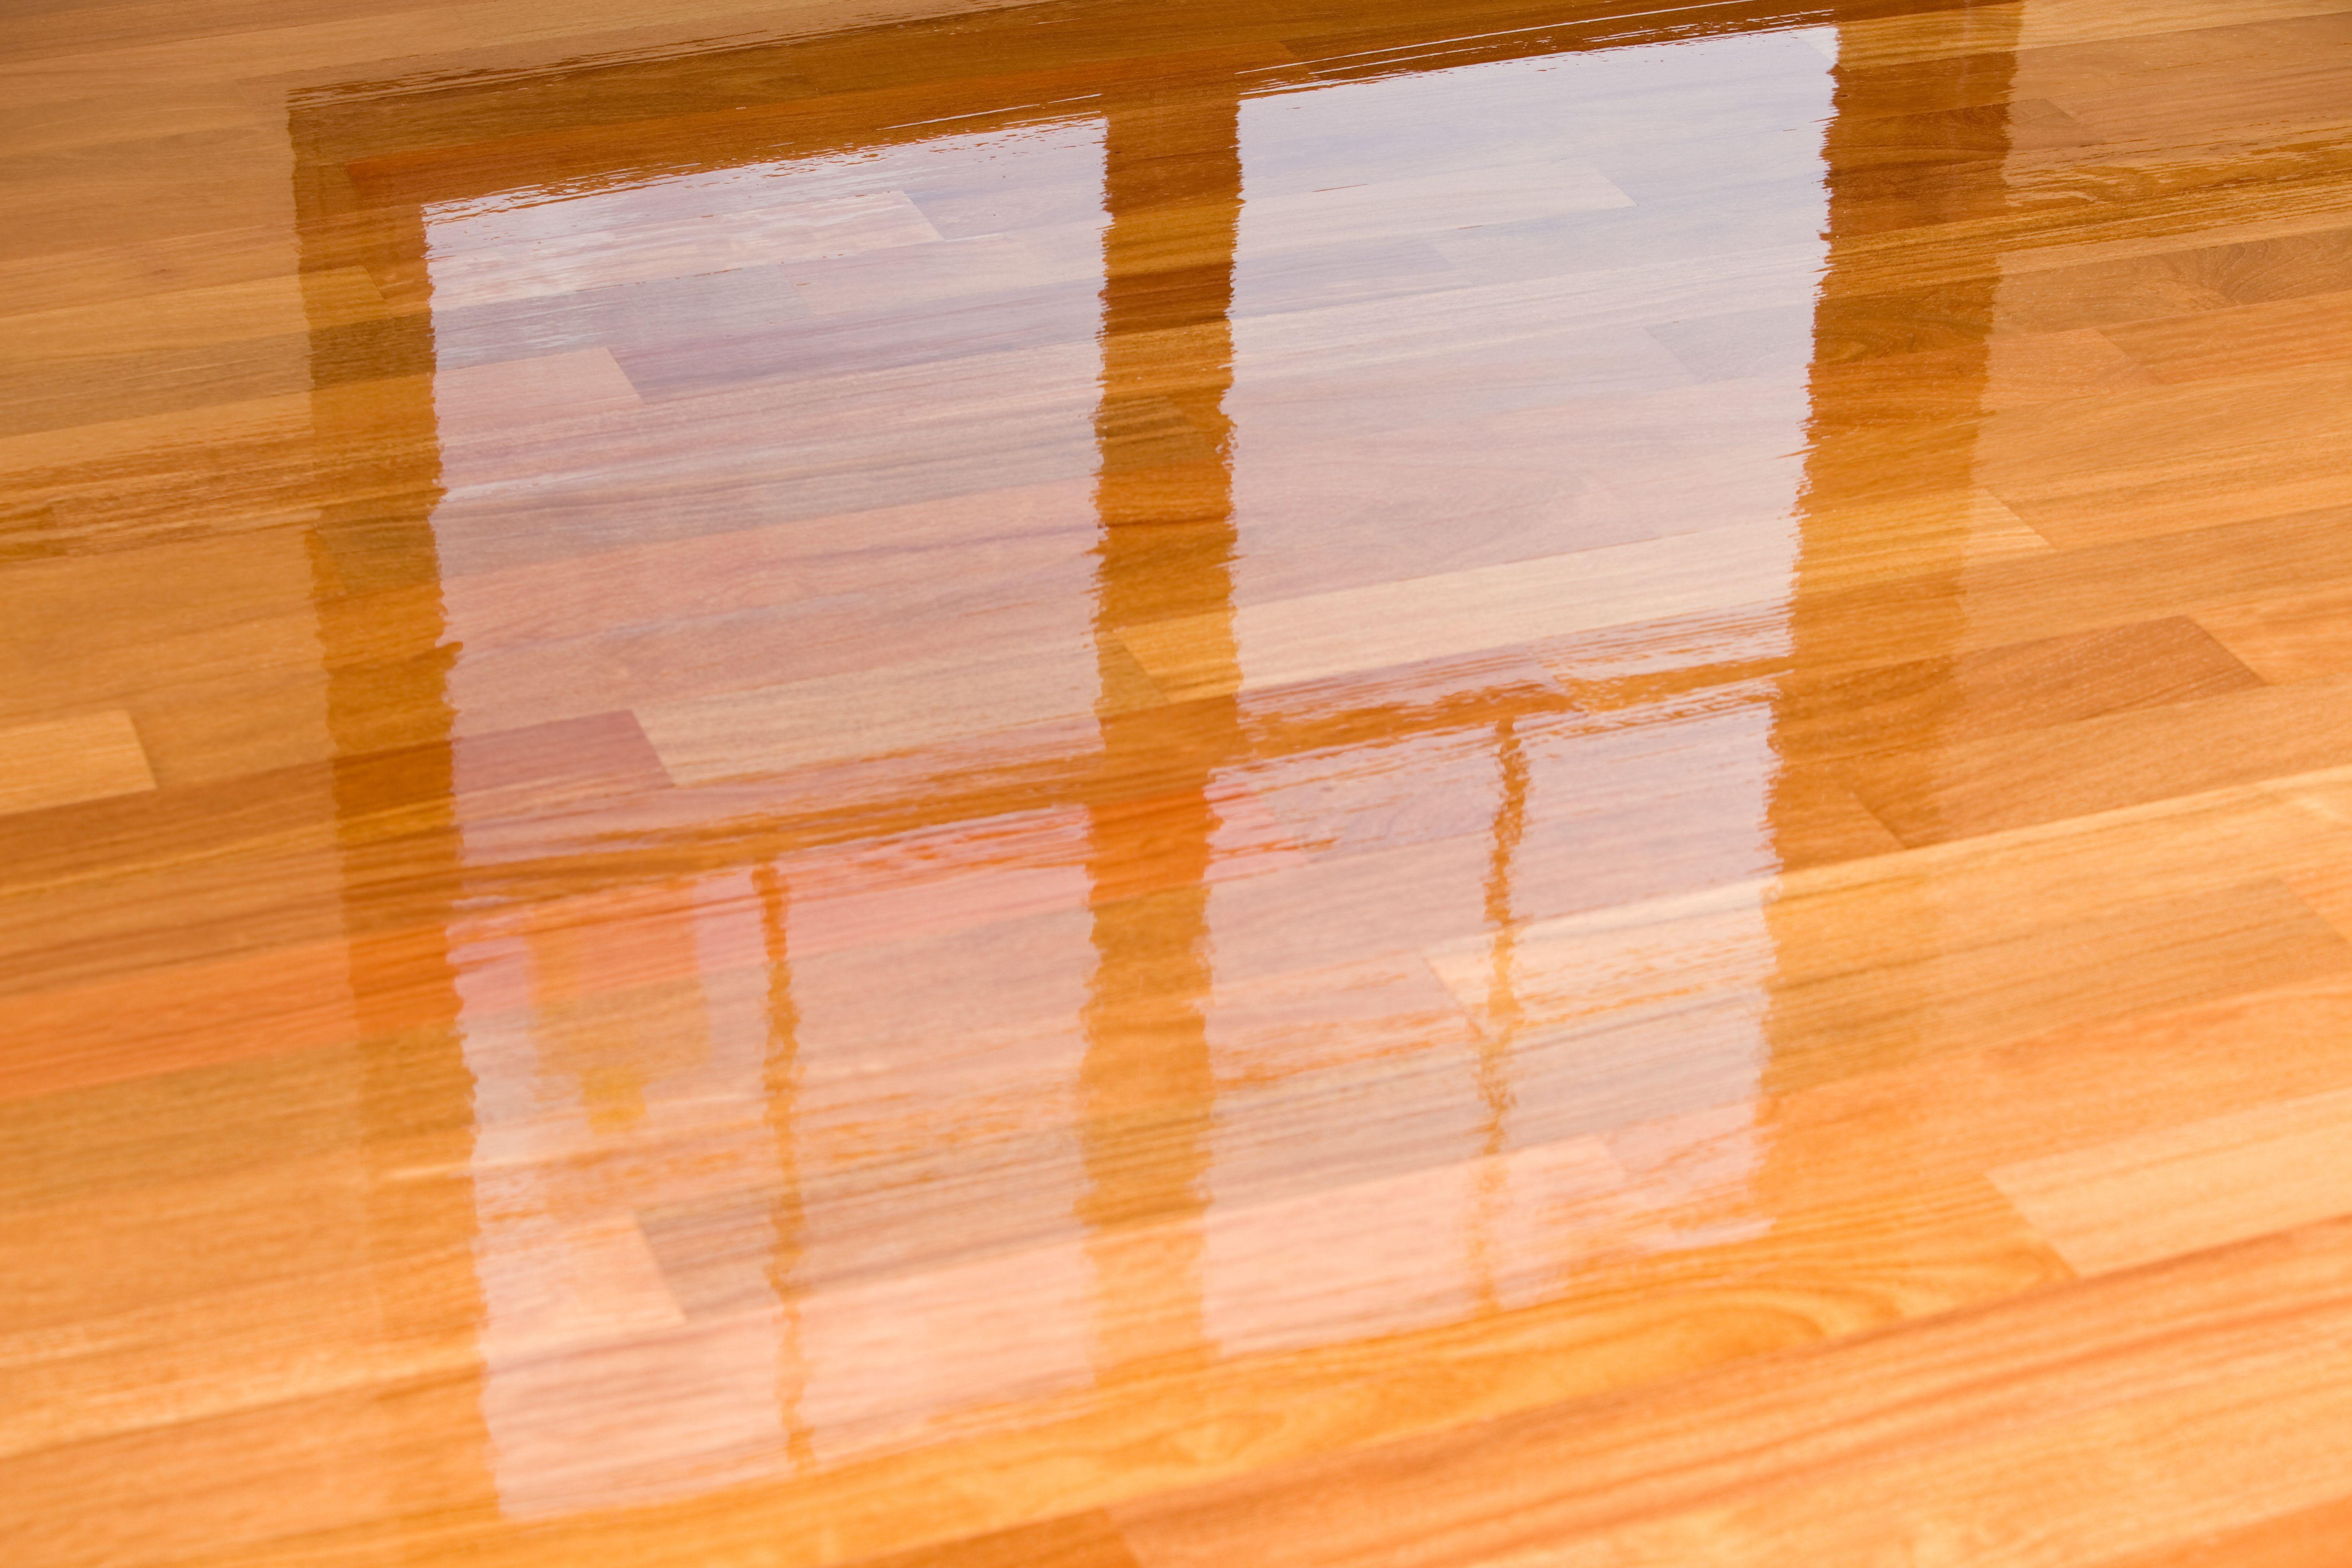 vinyl plank flooring vs hardwood of 18 luxury laminate vs engineered hardwood pics dizpos com in hardwood flooring vs engineered luxury floor laminate vs